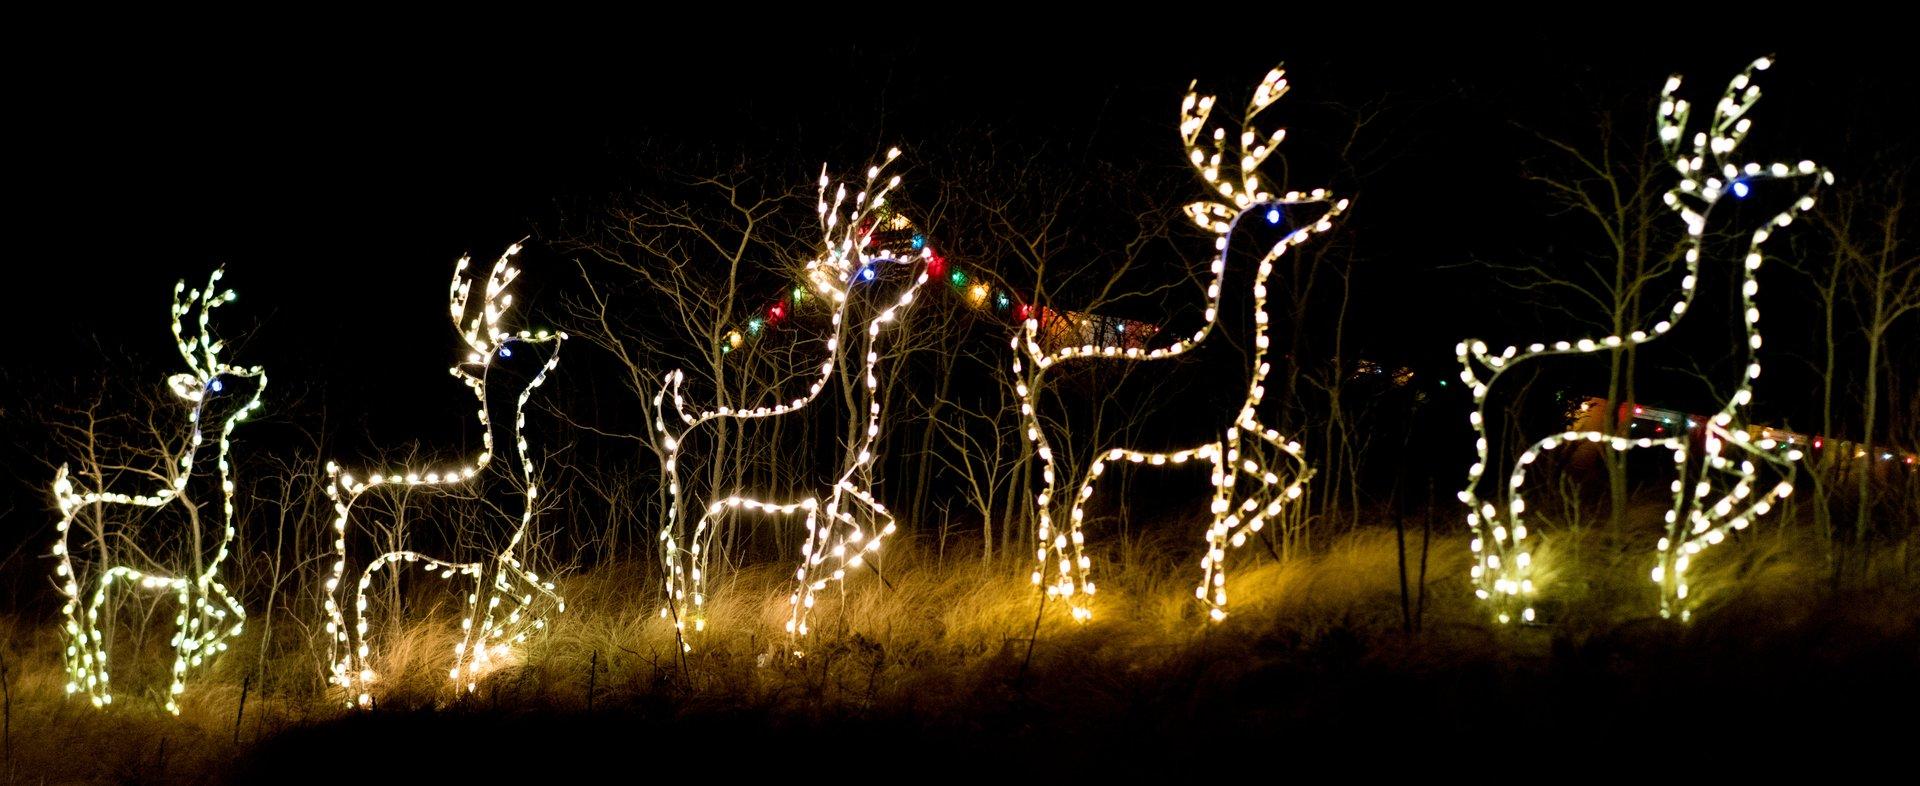 Christmas Lights in Delaware 2020 - Best Time